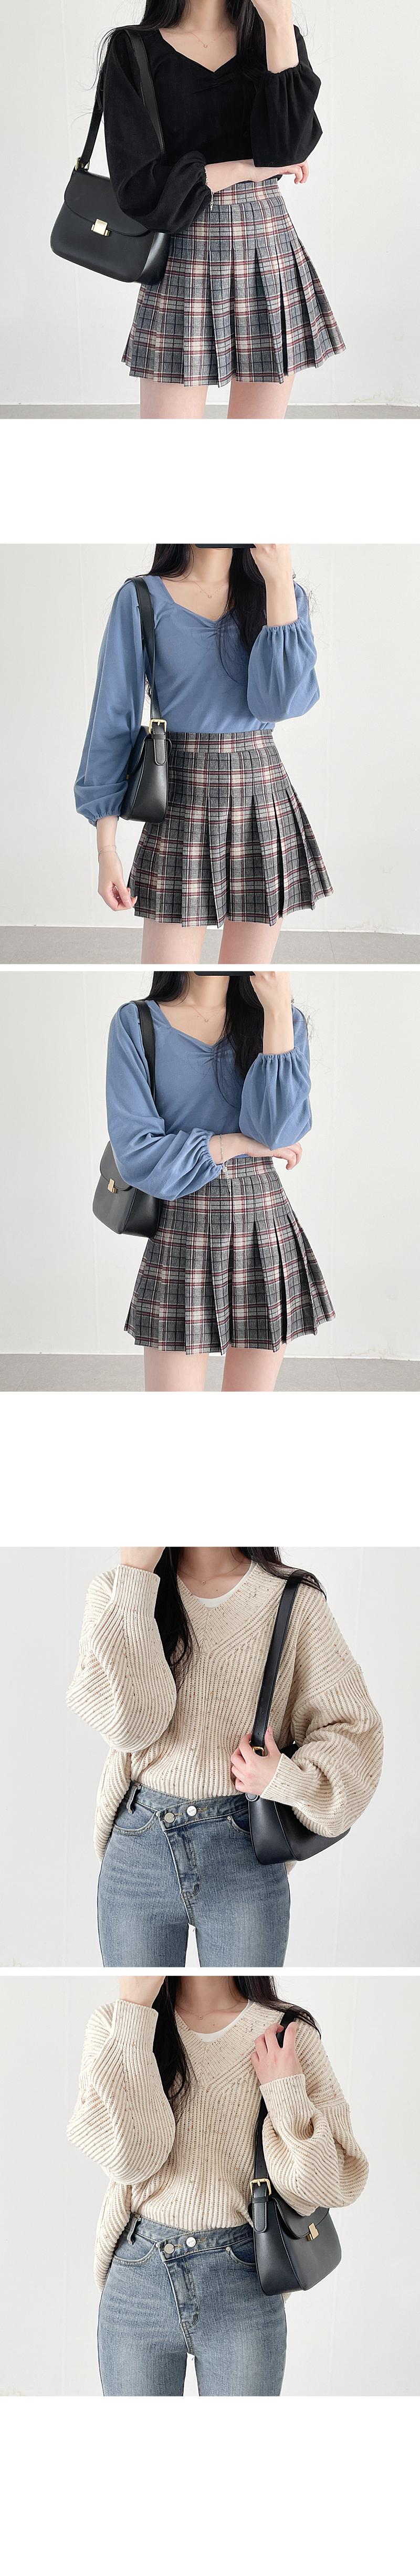 Coyu cross & shoulder bag